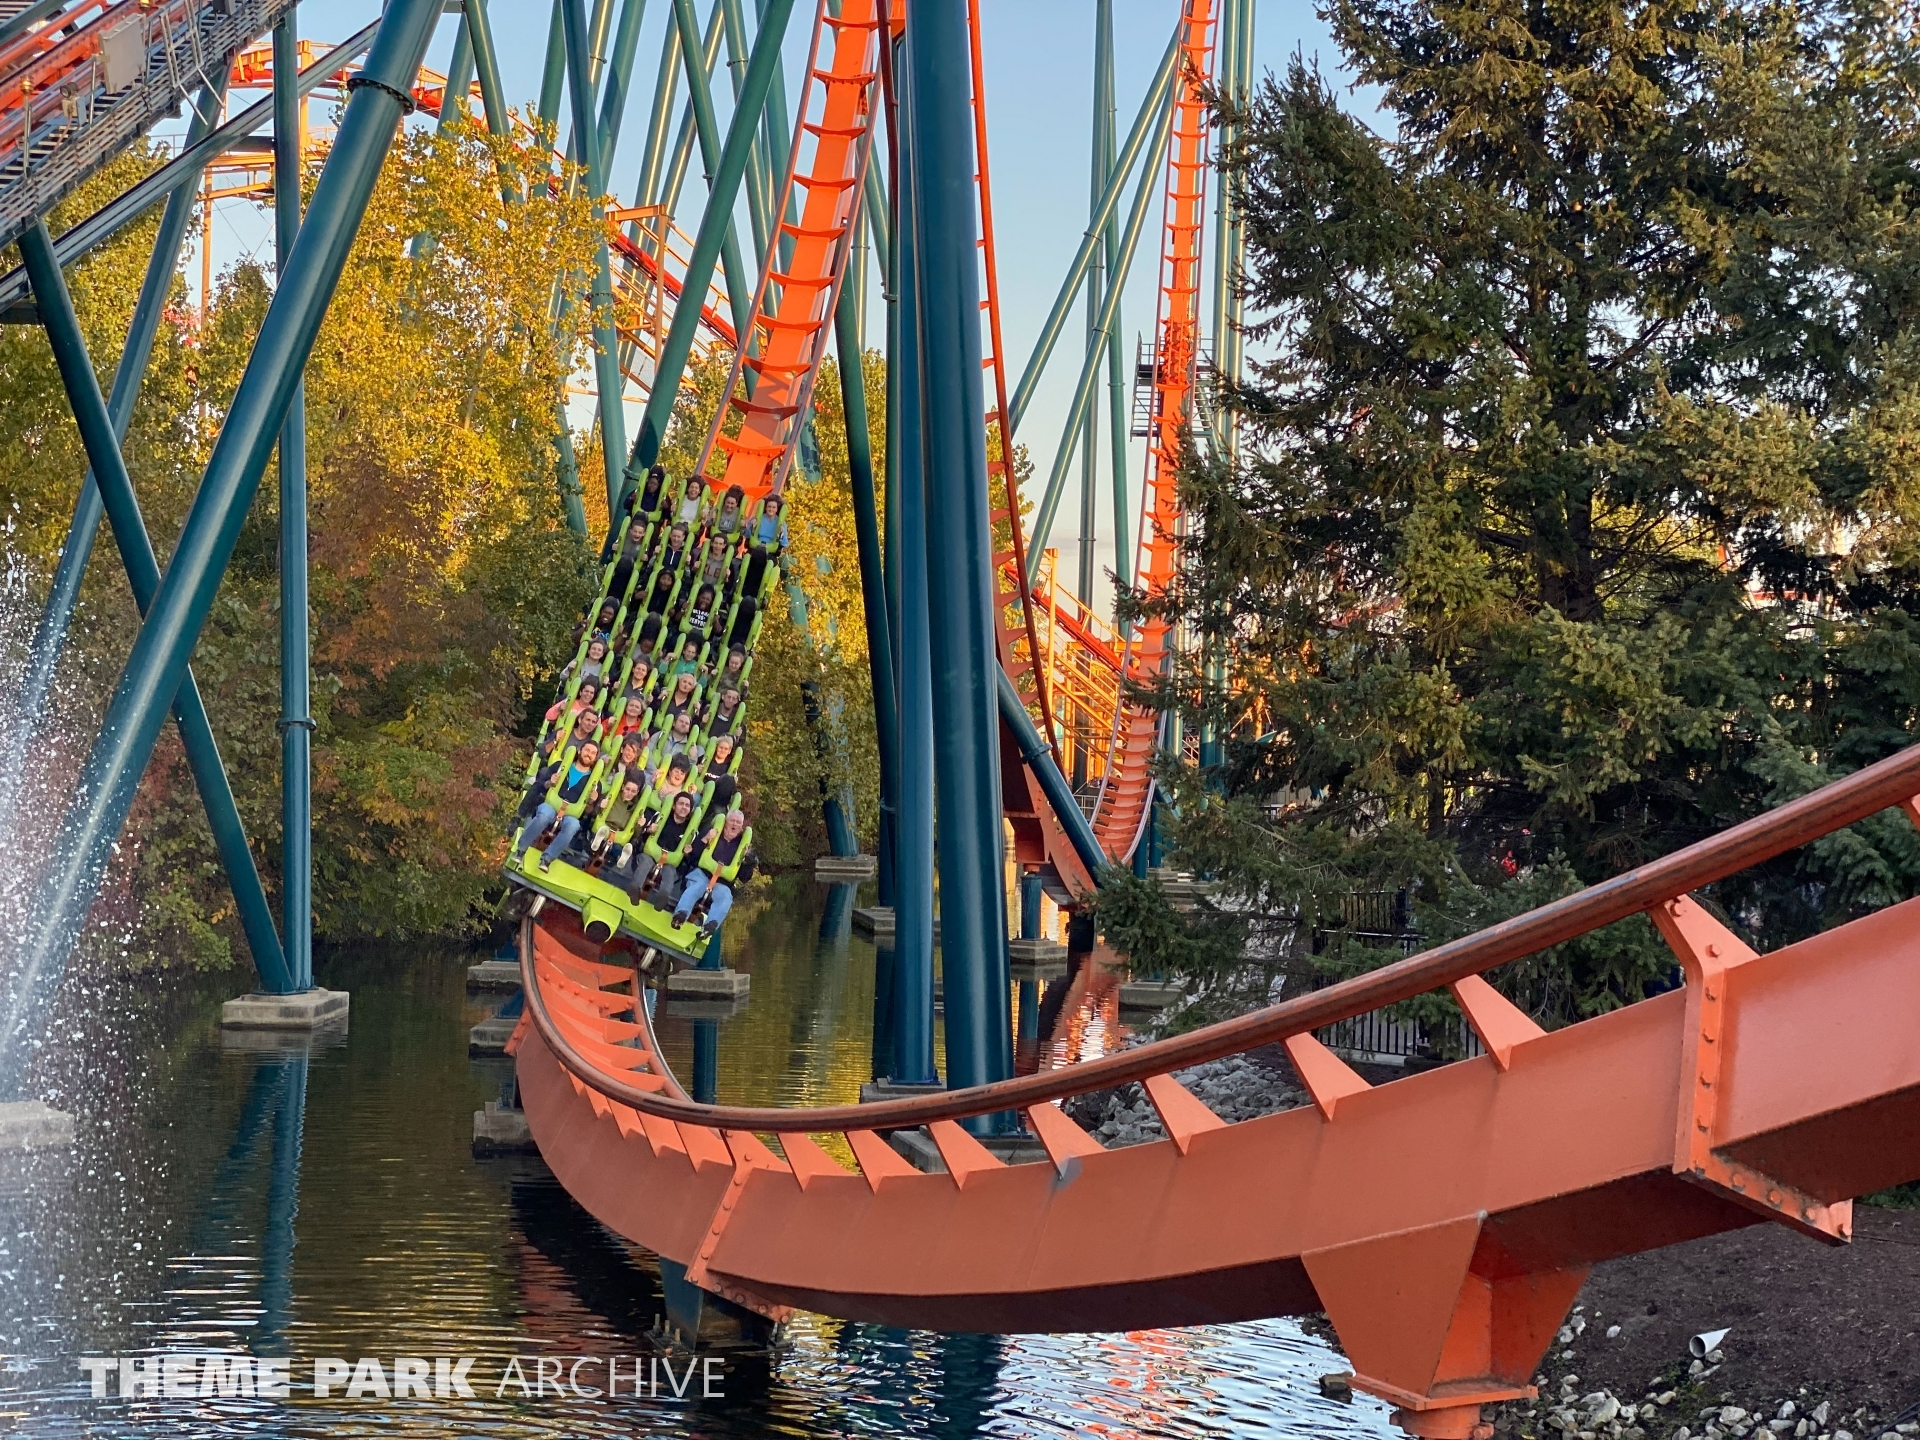 Cedar Point Halloweekends 2019